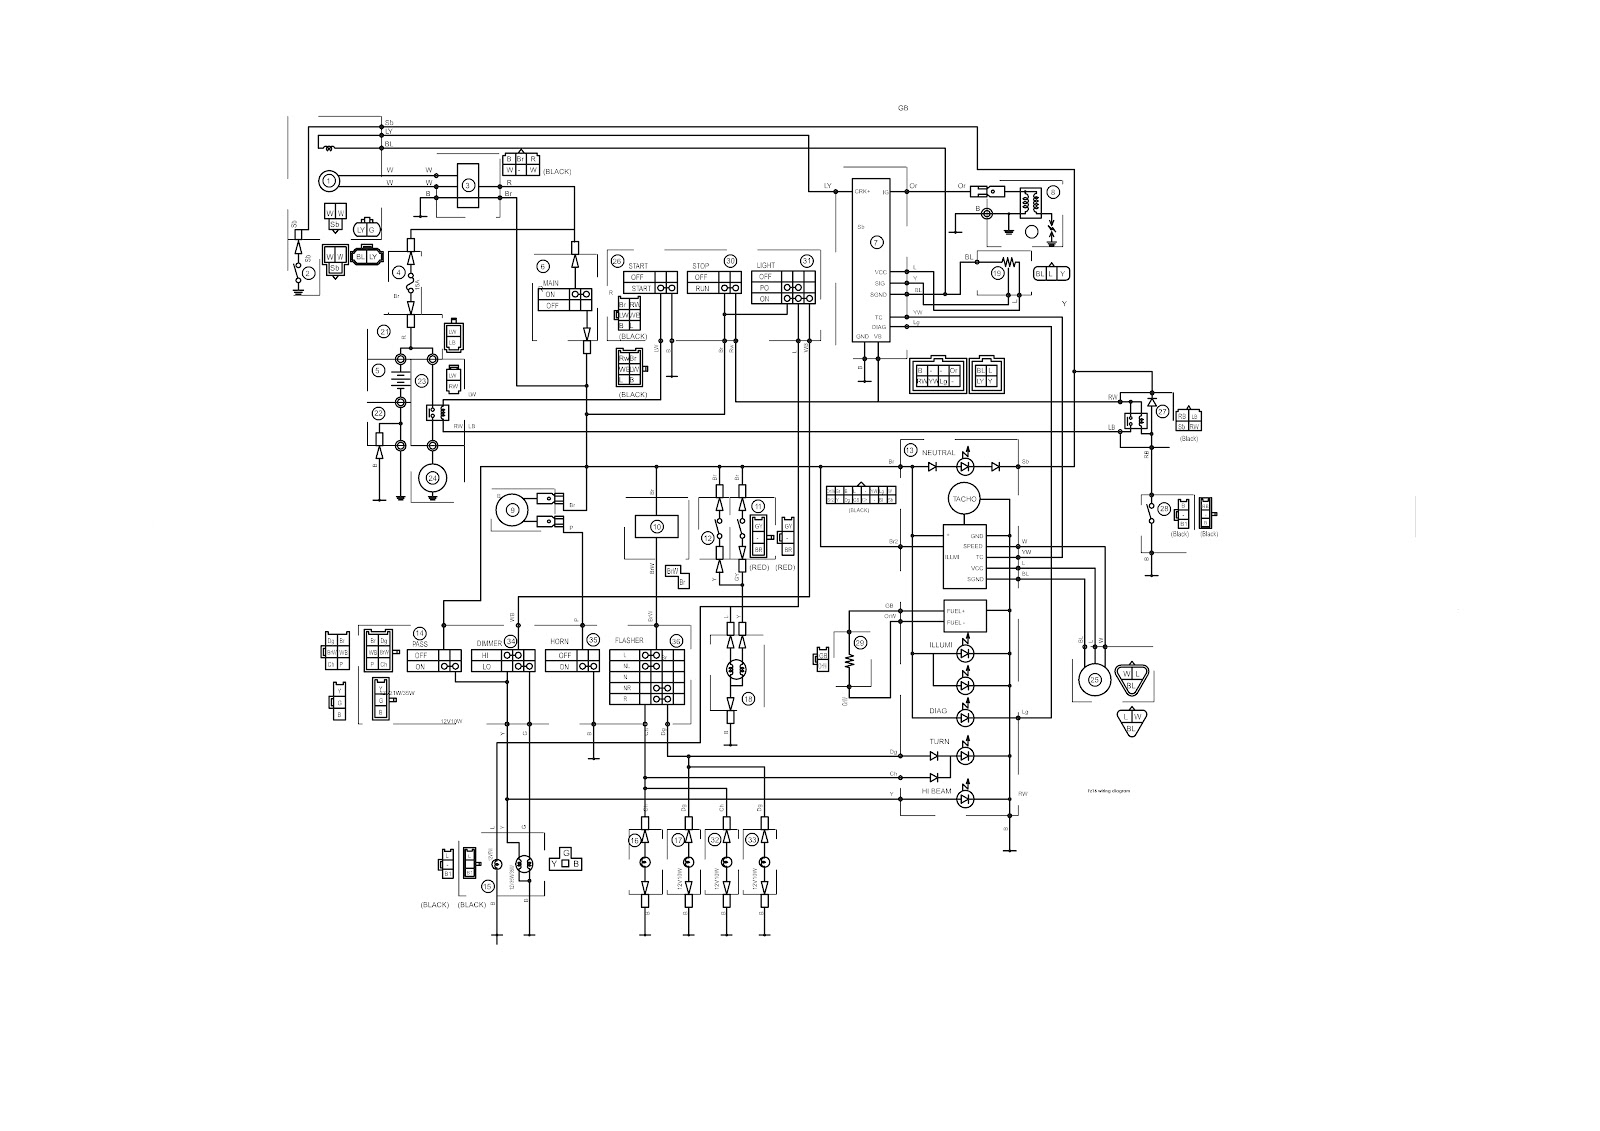 Yamaha Fzr Wiring Diagram Yzf 450 Pengkabelan Byson Menjual Spare Rh Sukucadangyamaha Blogspot Com Fz 09 1000